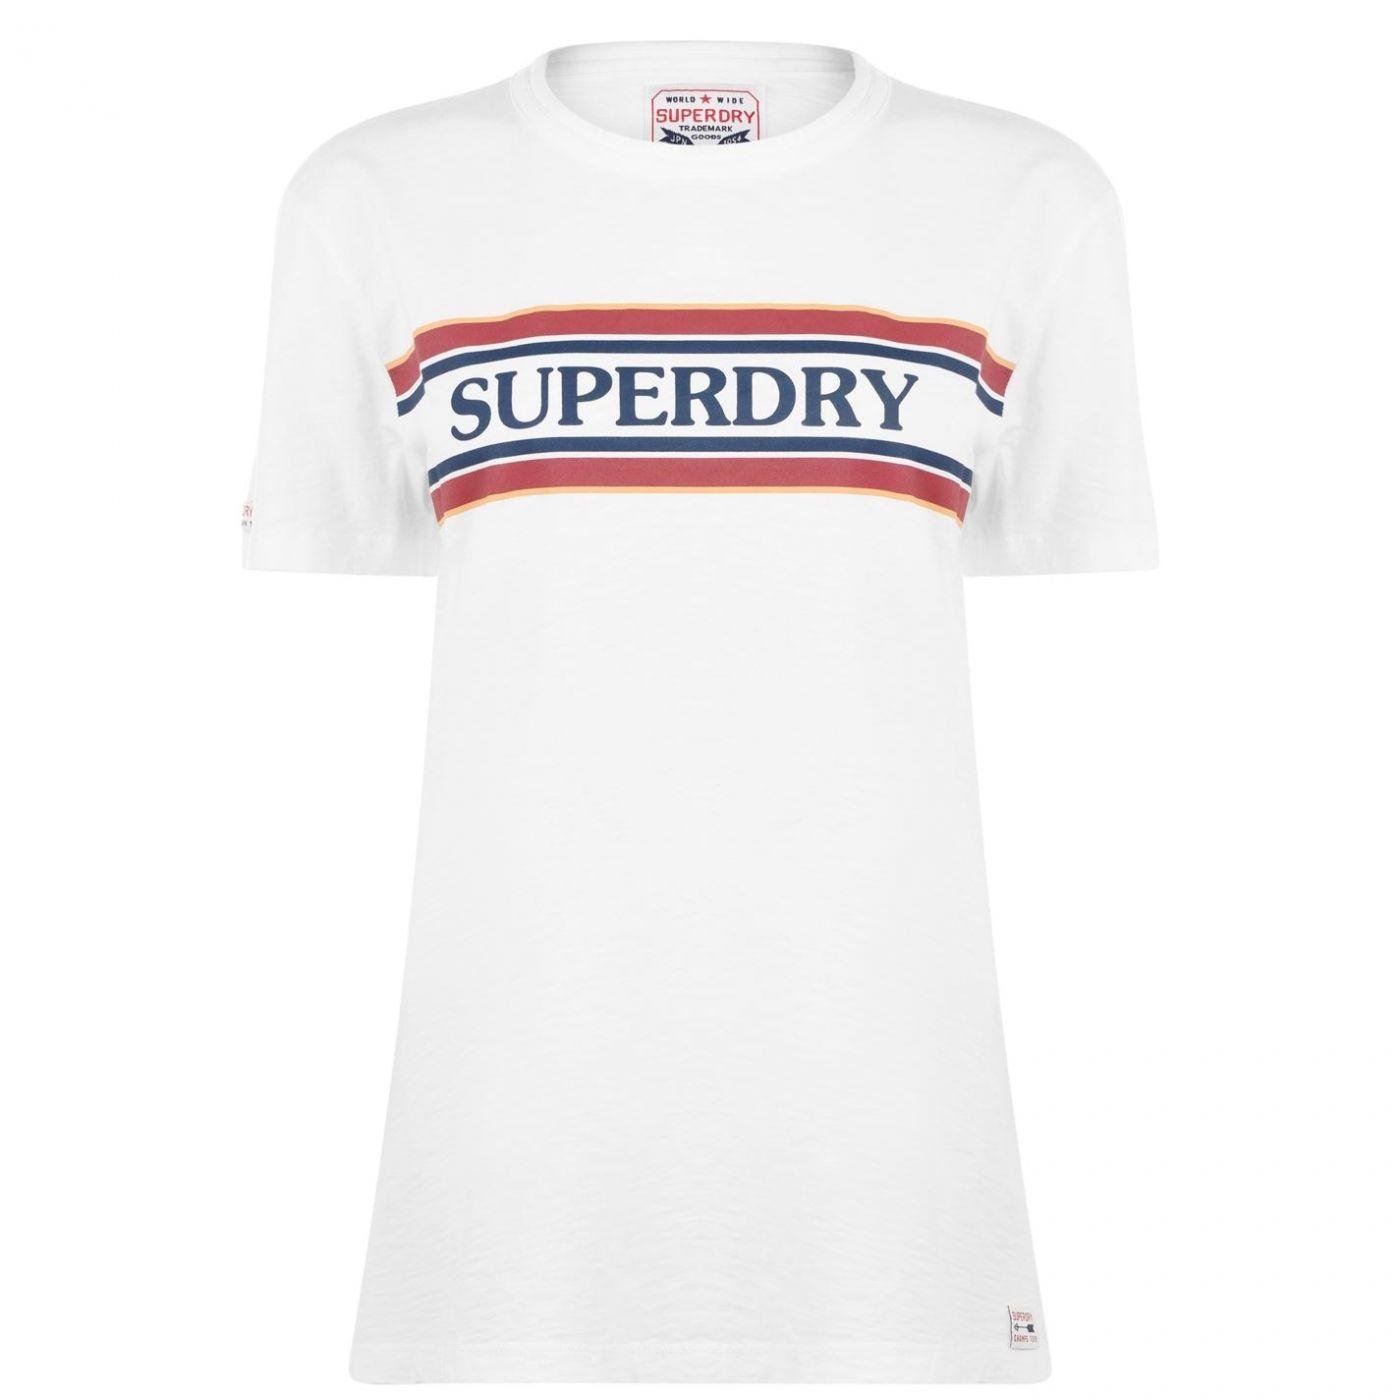 Superdry Text T Shirt